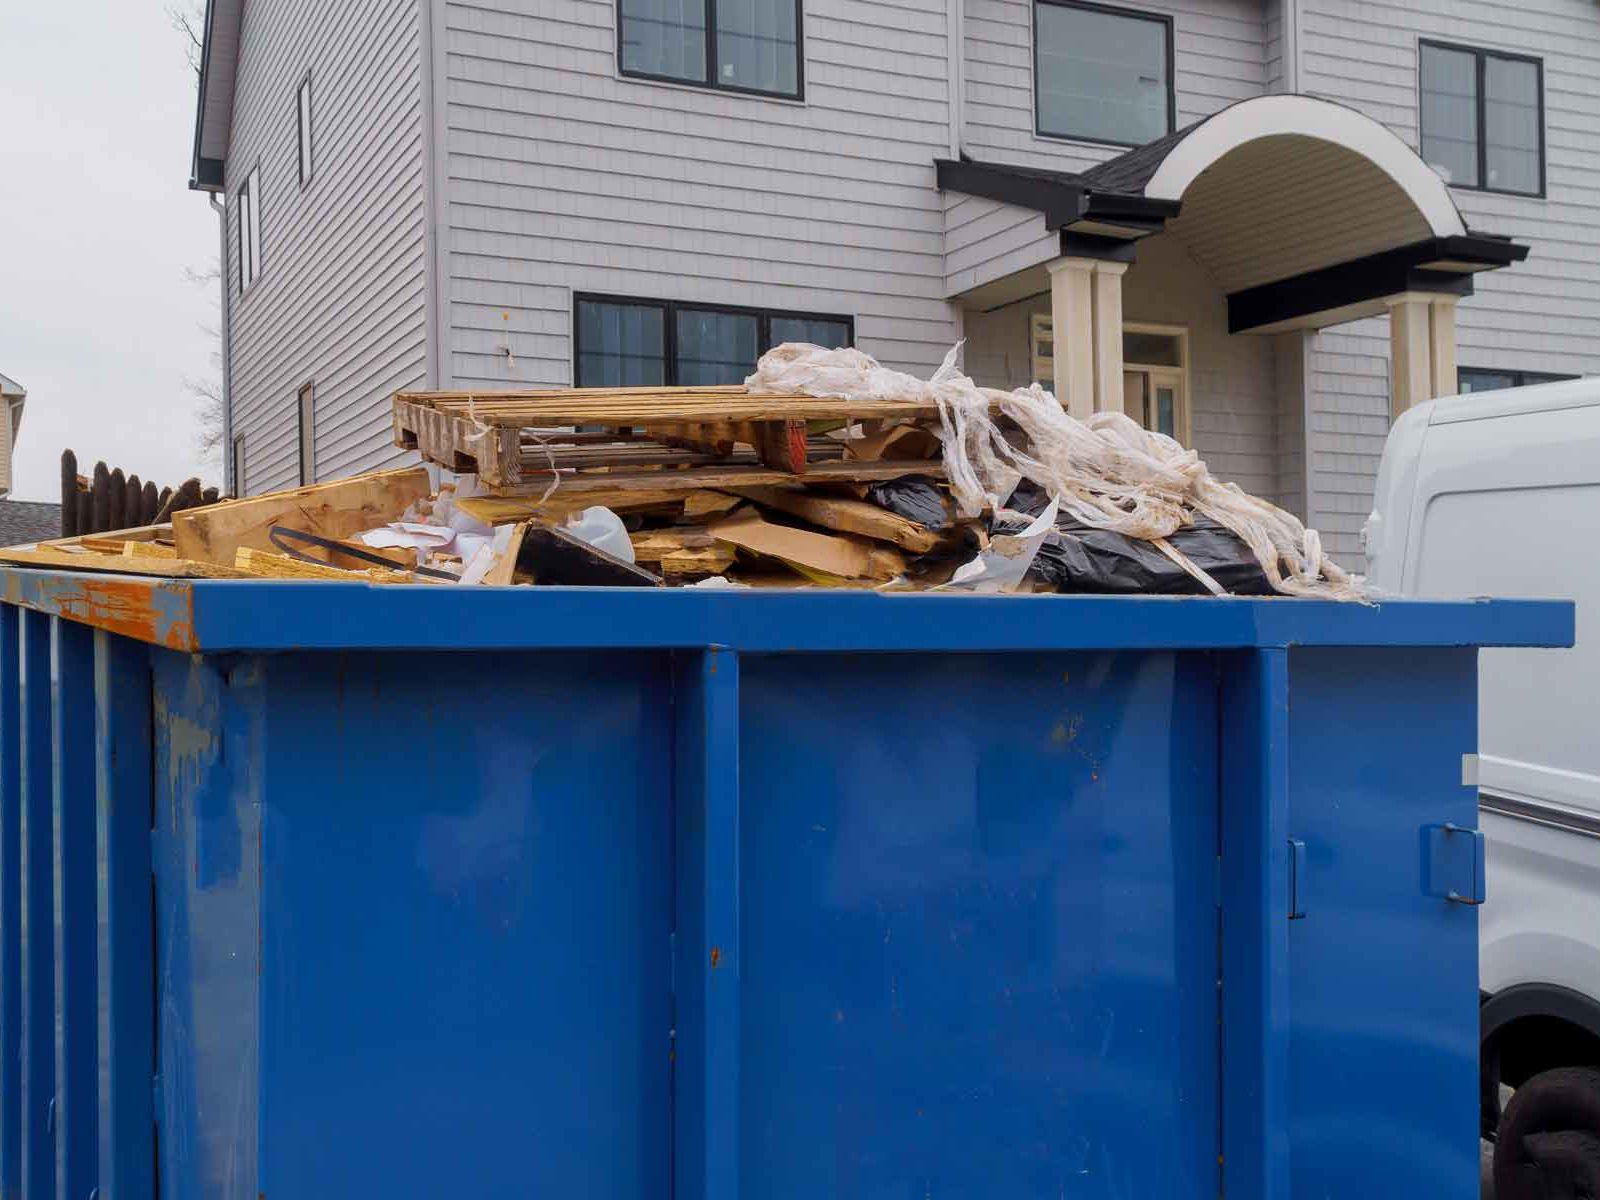 residential dumpster rentals